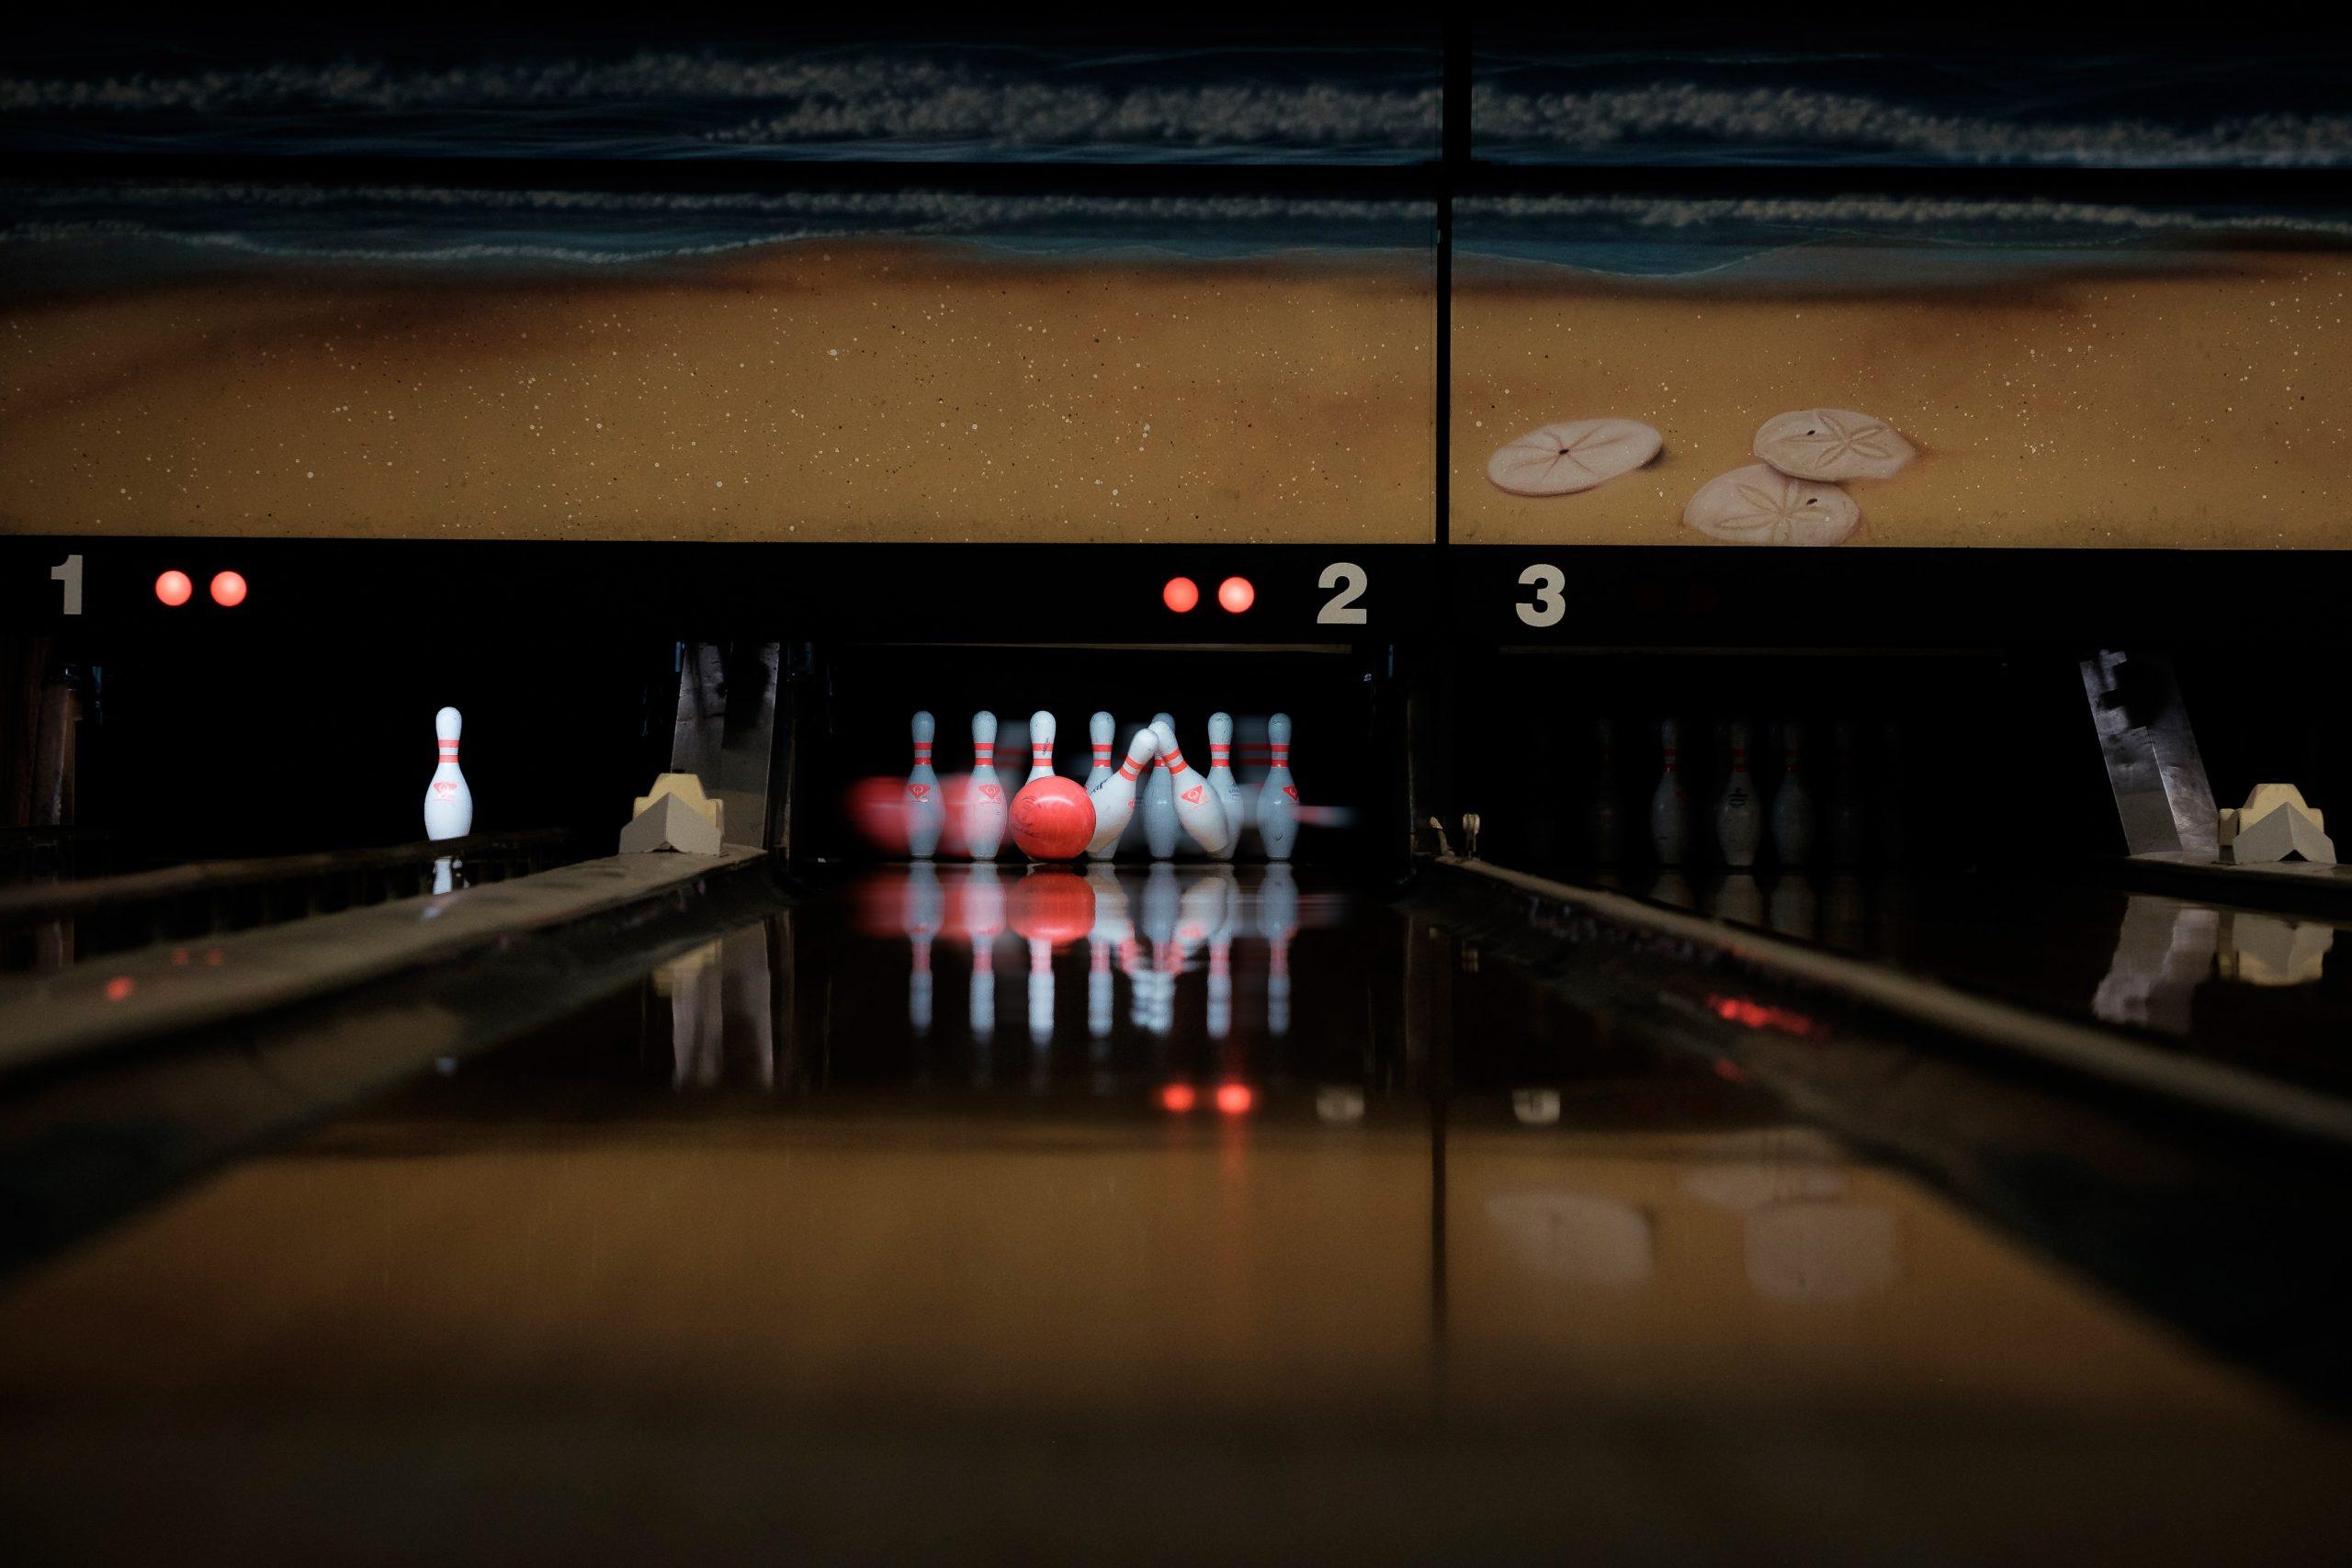 Moody bowling lane